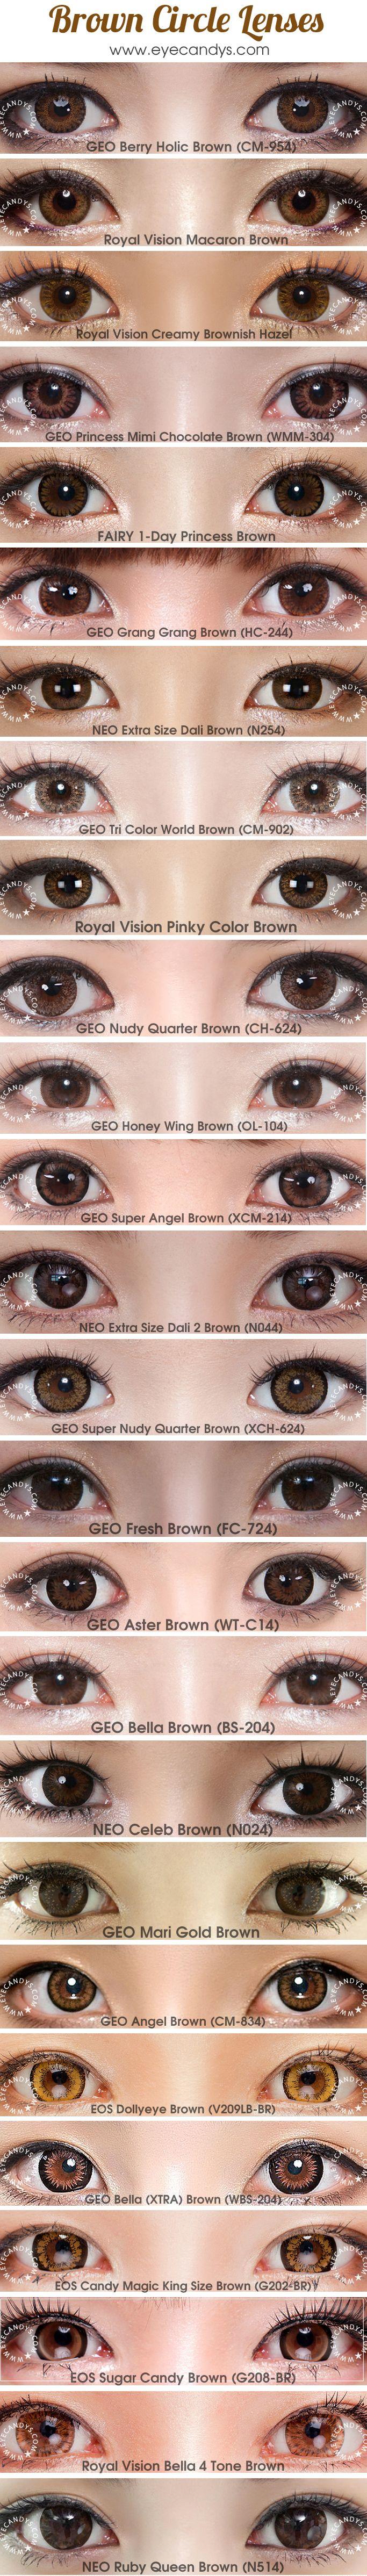 Color contact lenses online shop - Brown Honey Hazel Chocolate Circle Lenses Colored Contact Lens Authentic